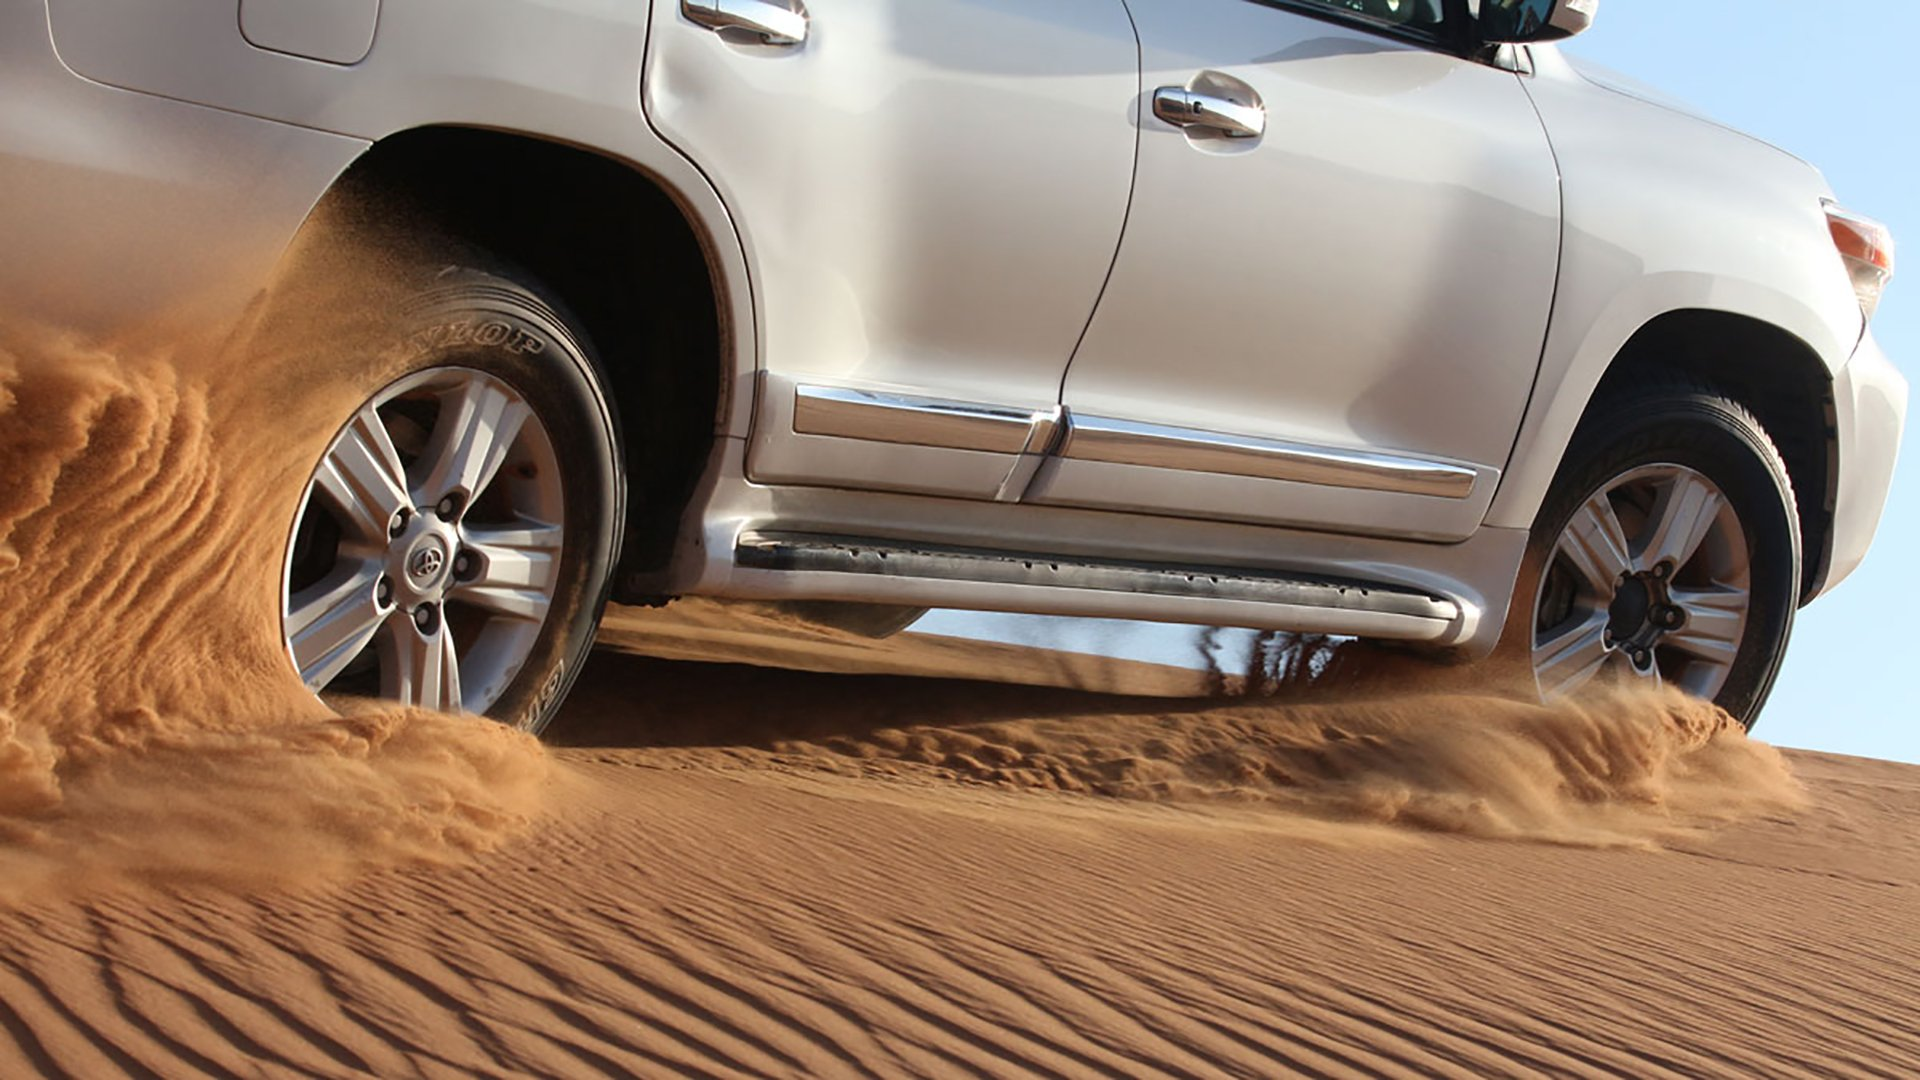 Red Dune Safari, Quad Bike, Sandboarding & Camel Ride Experience From Dubai_101_3